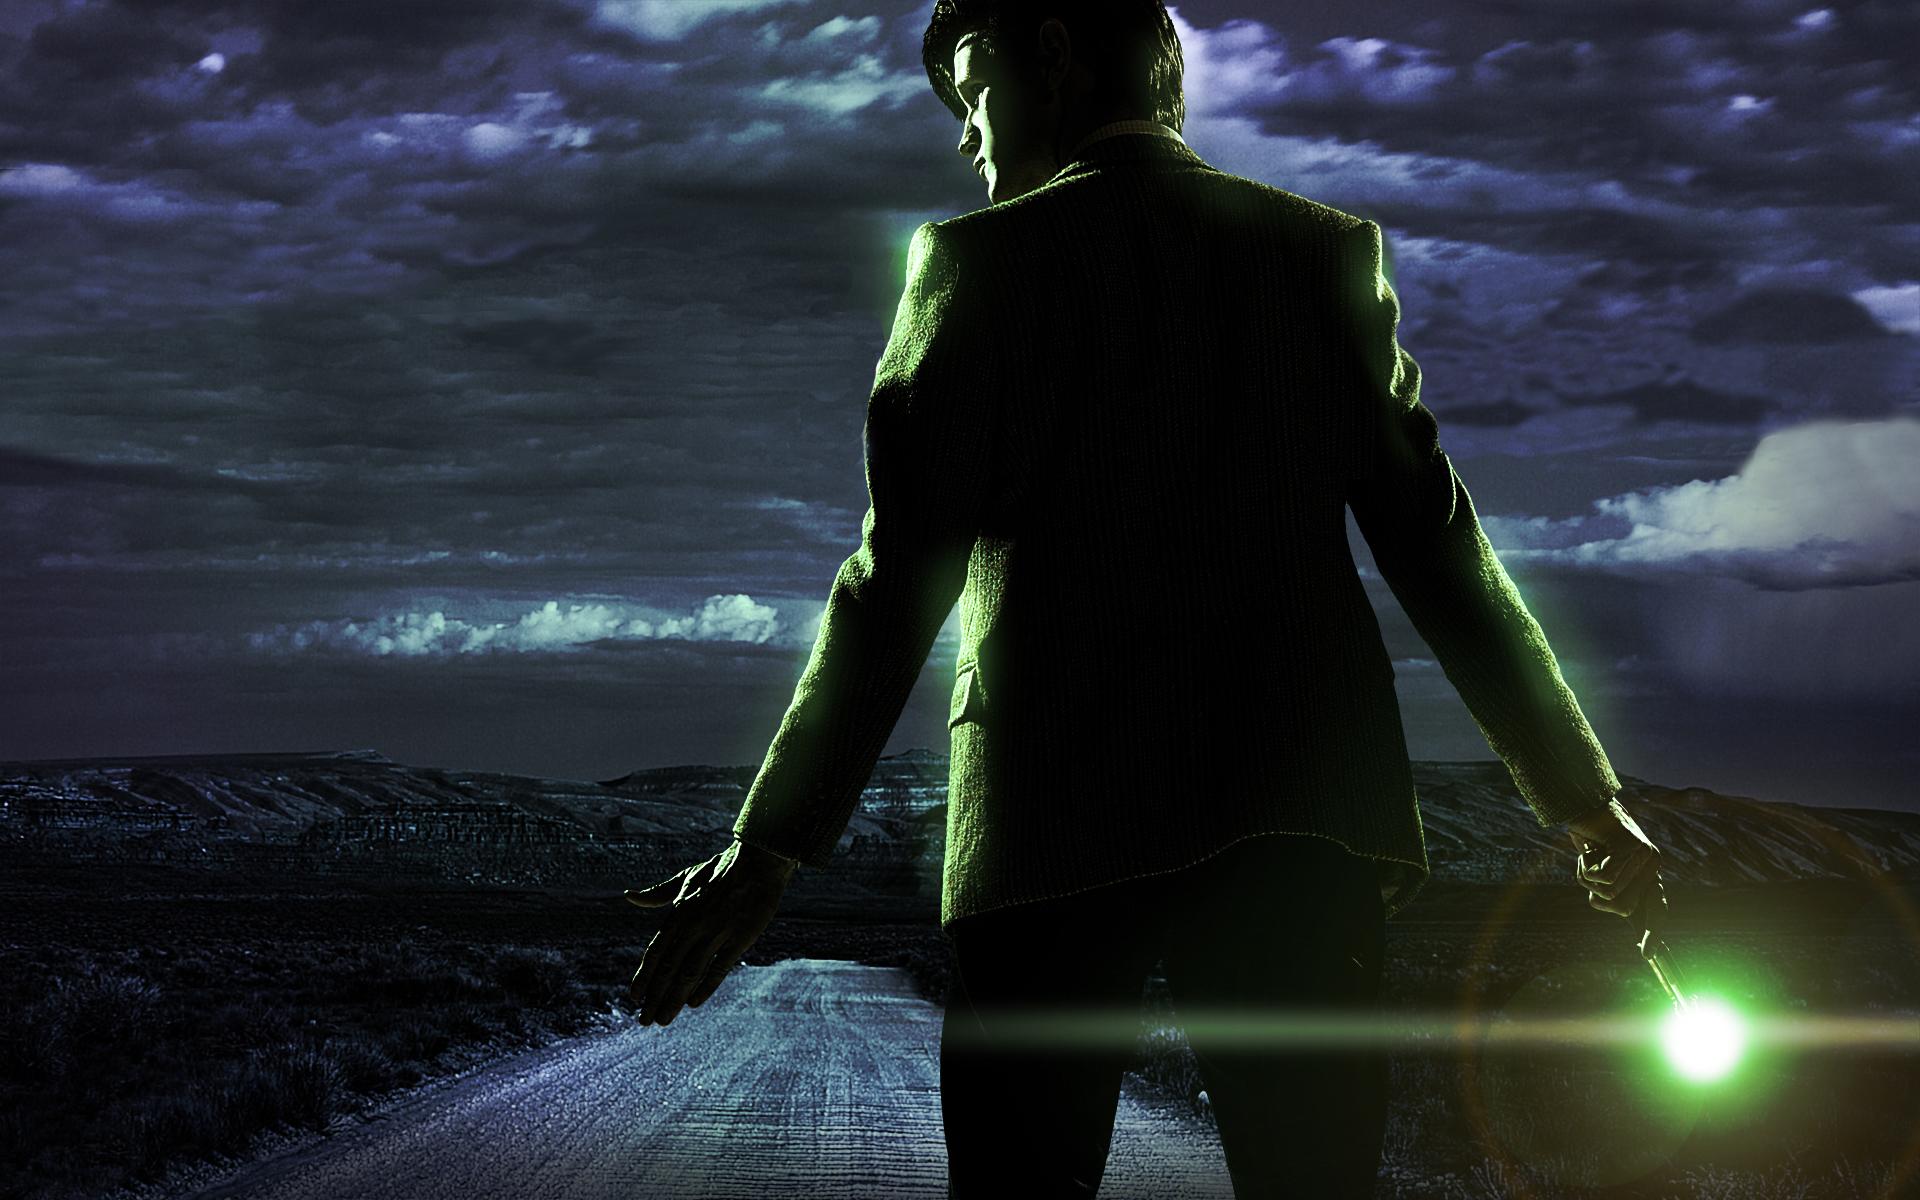 Matt Smith Eleventh Doctor Doctor Who wallpaper 1920x1200 227194 1920x1200